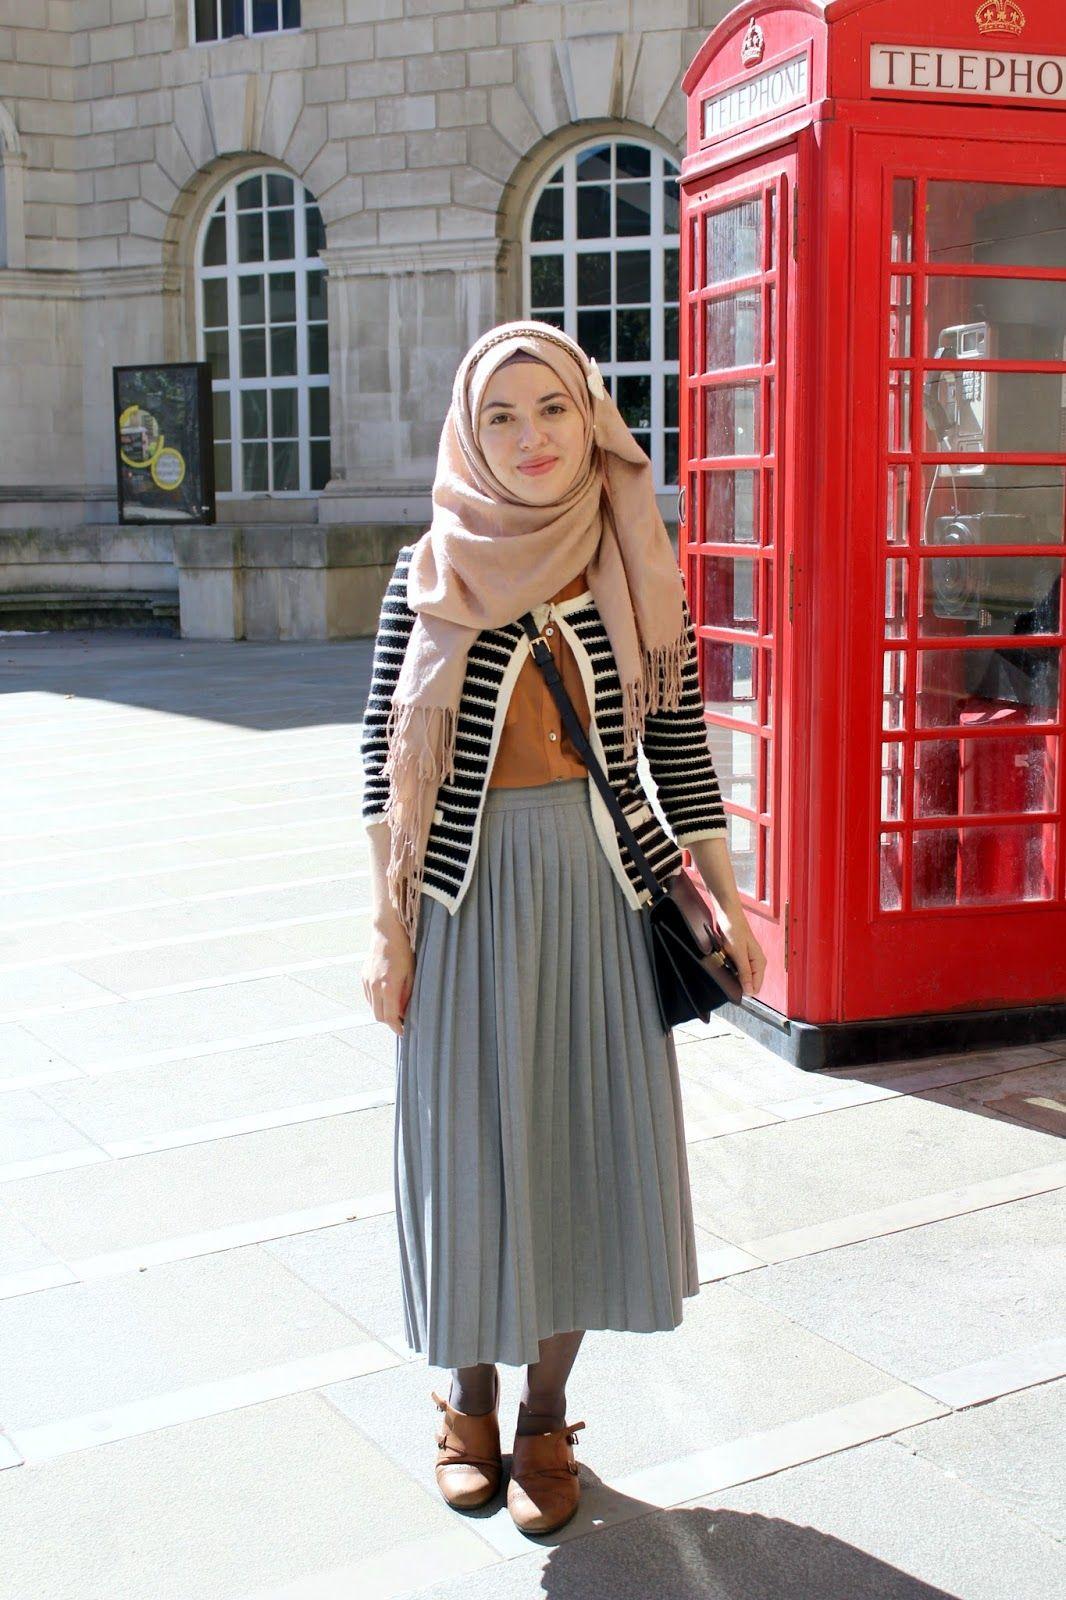 Inspirasi Gaya Hijab Vintage Fashion Model Pakaian Hijab Model Pakaian Gaya Berpakaian